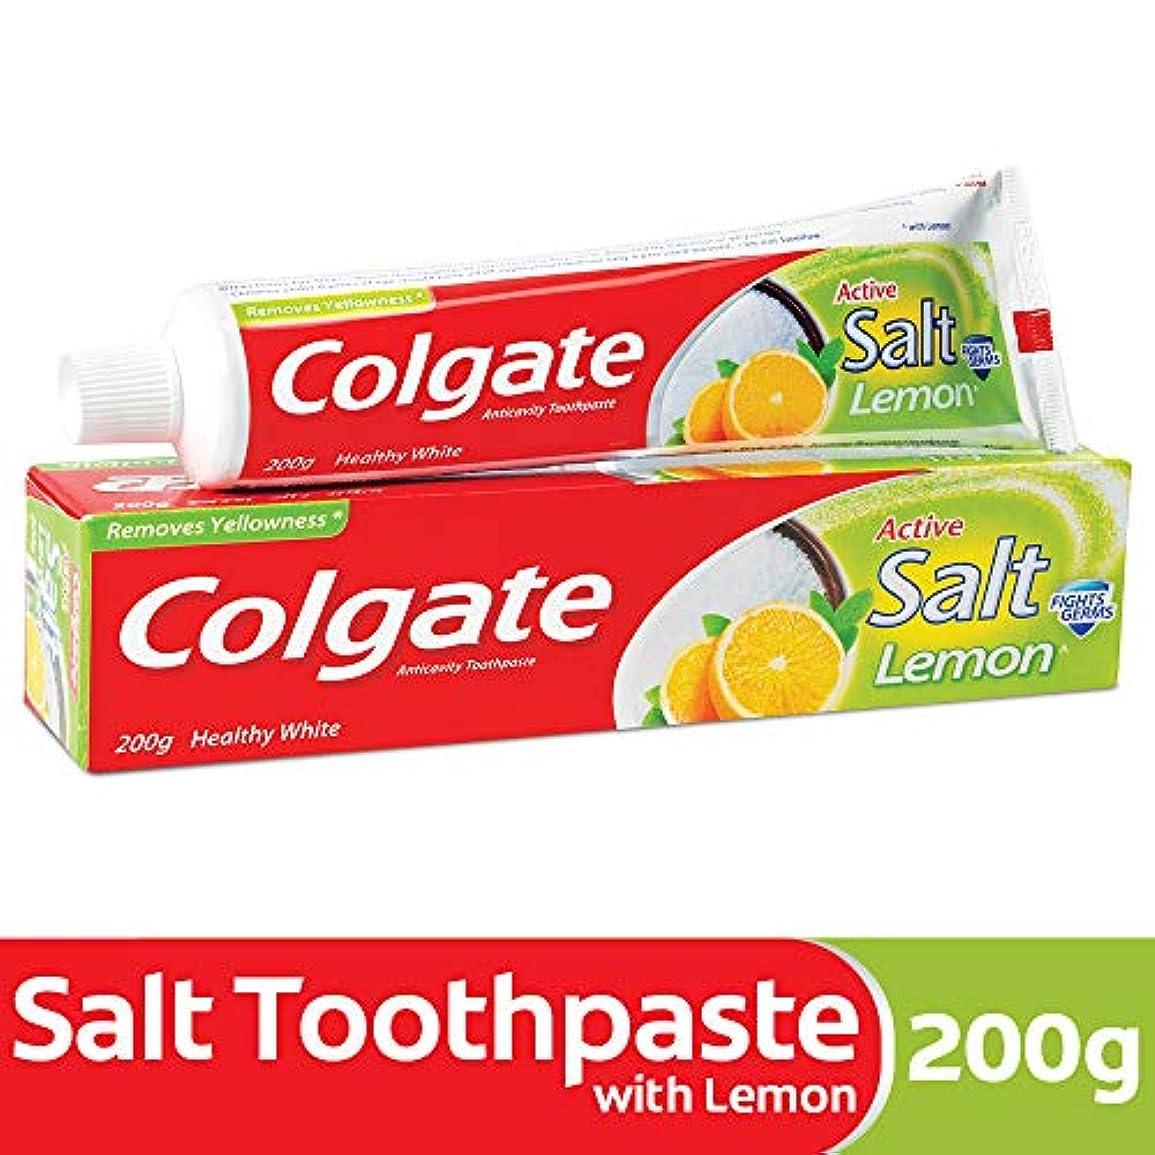 環境保護主義者収益保持するColgate Toothpaste Active Salt - 200 g (Salt and Lemon)